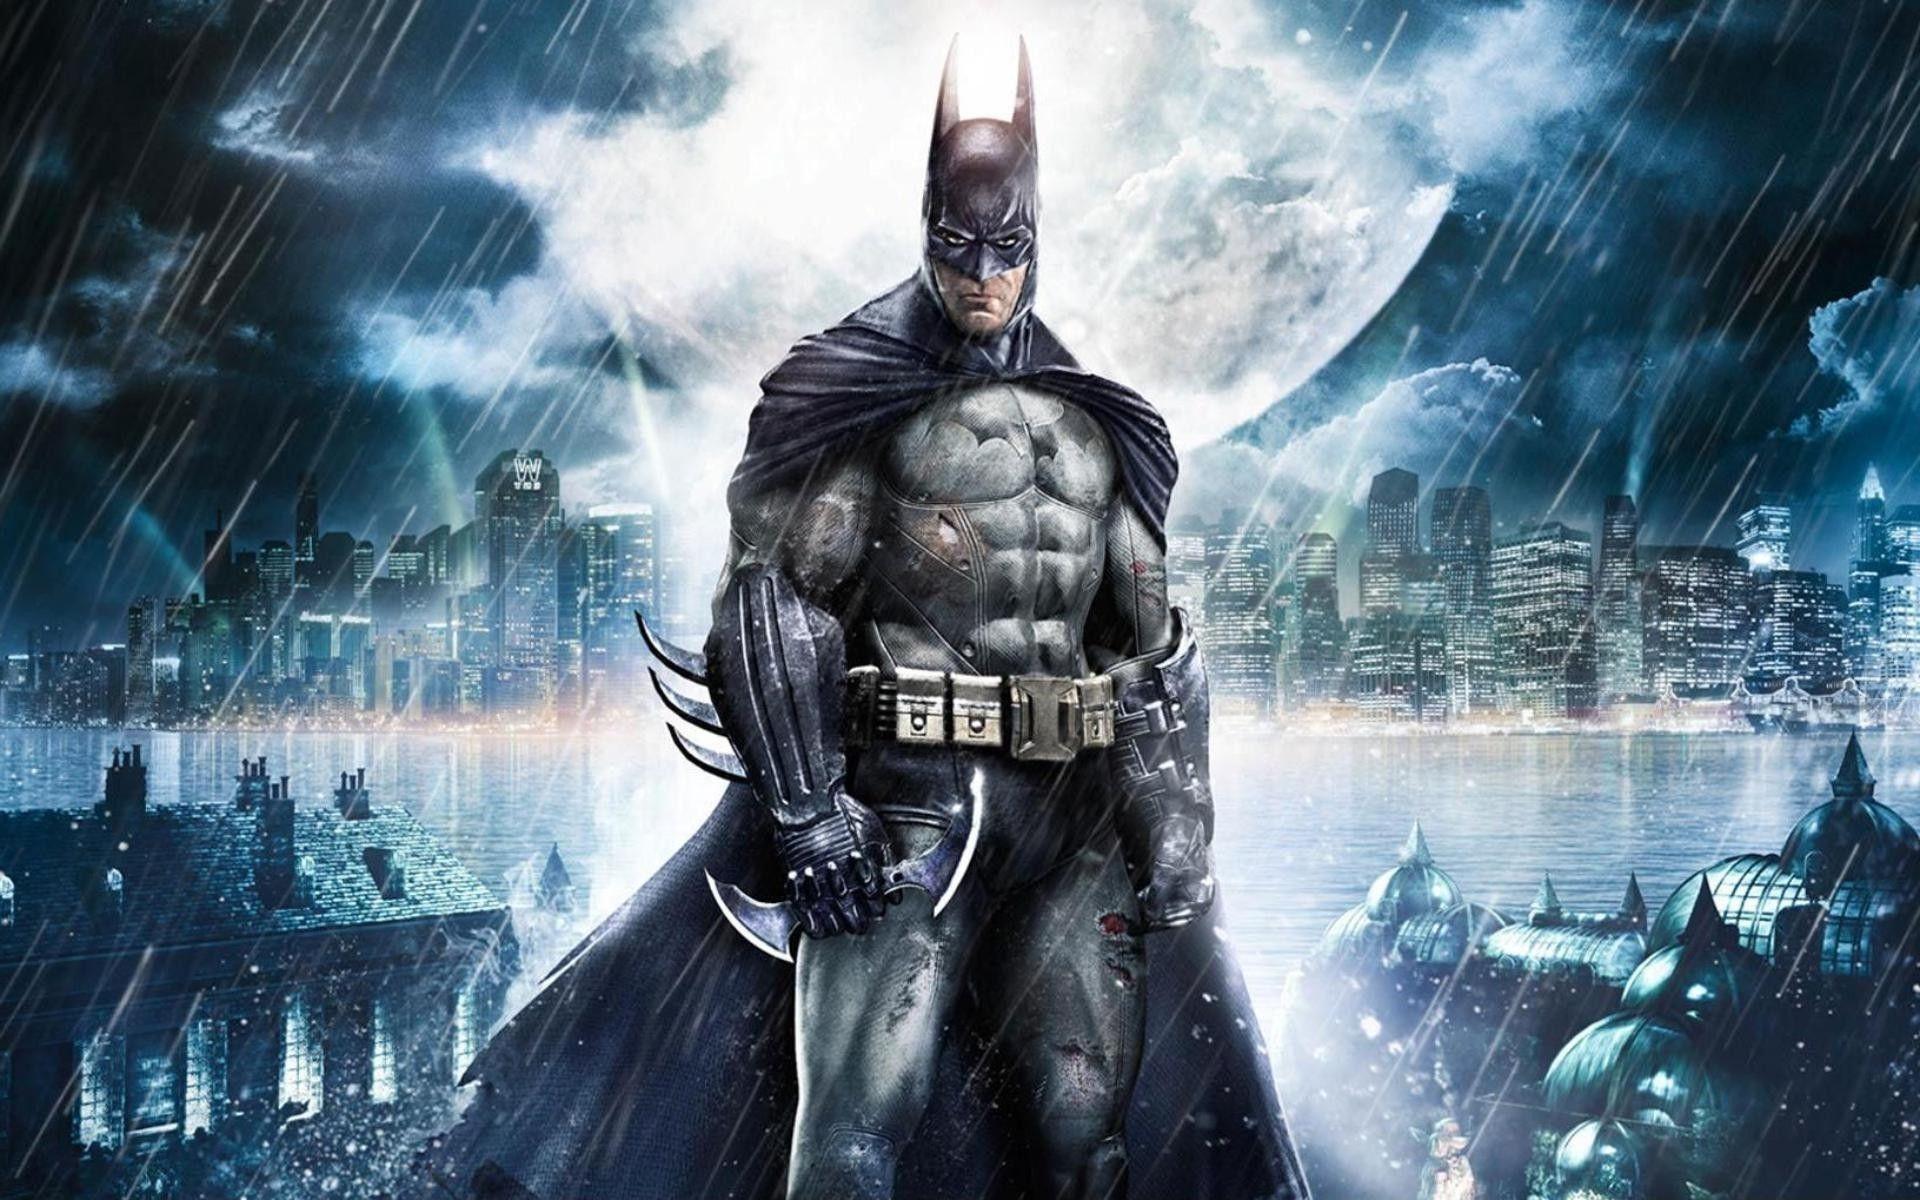 Wallpaper download action - Batman Arkham Knight Beth Car Hd Wallpaper Download For Mobile 1920 1080 Batman Wallpapers Download